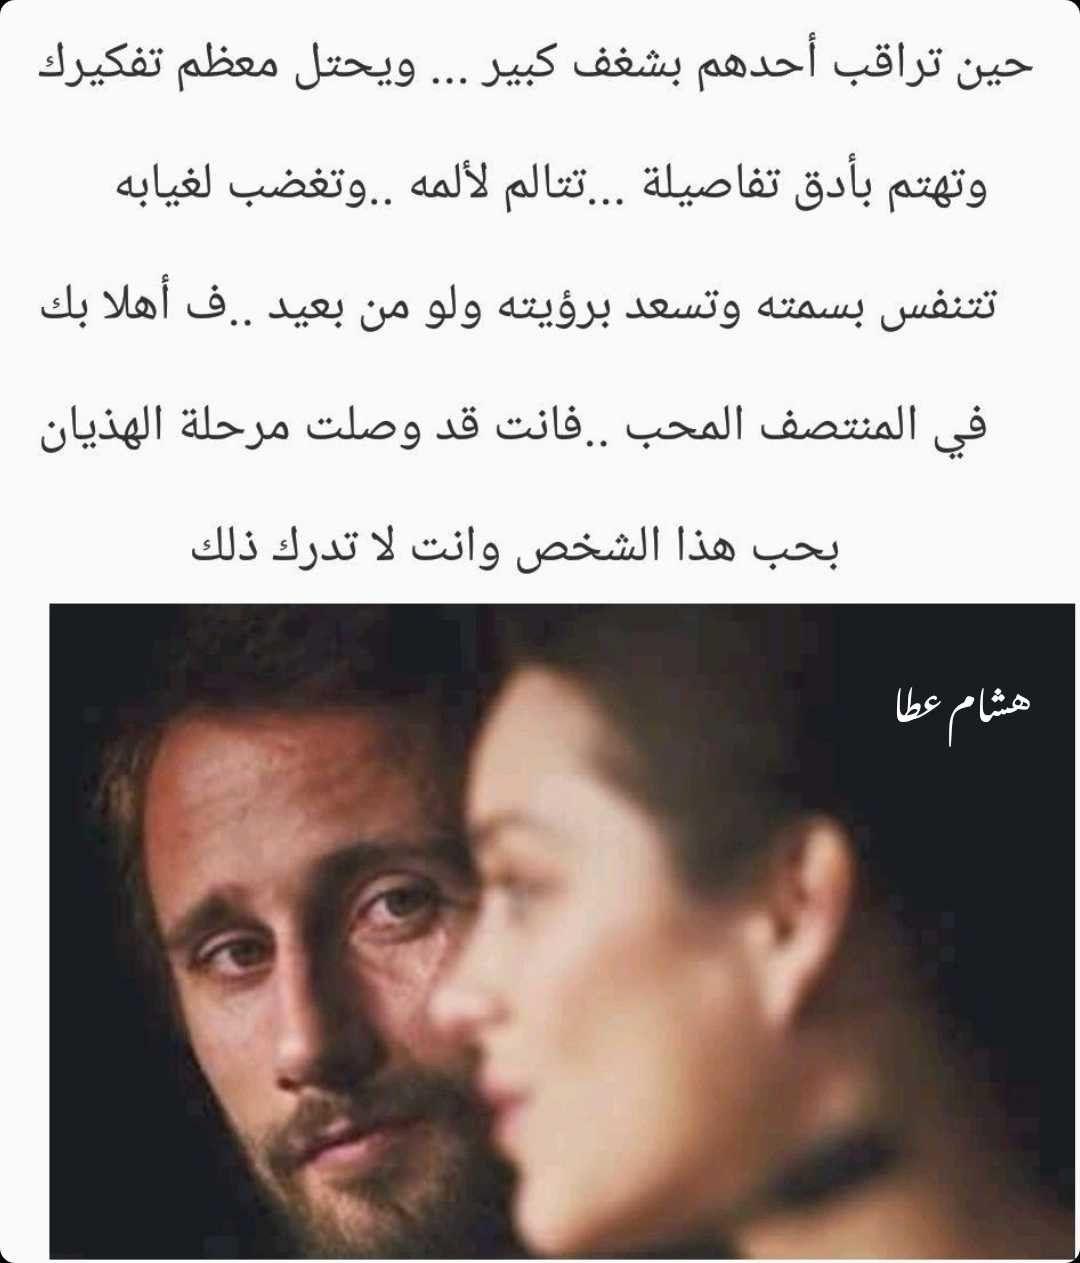 Pin by Hisham Ataa on شعر | Arabic love quotes, Arabic